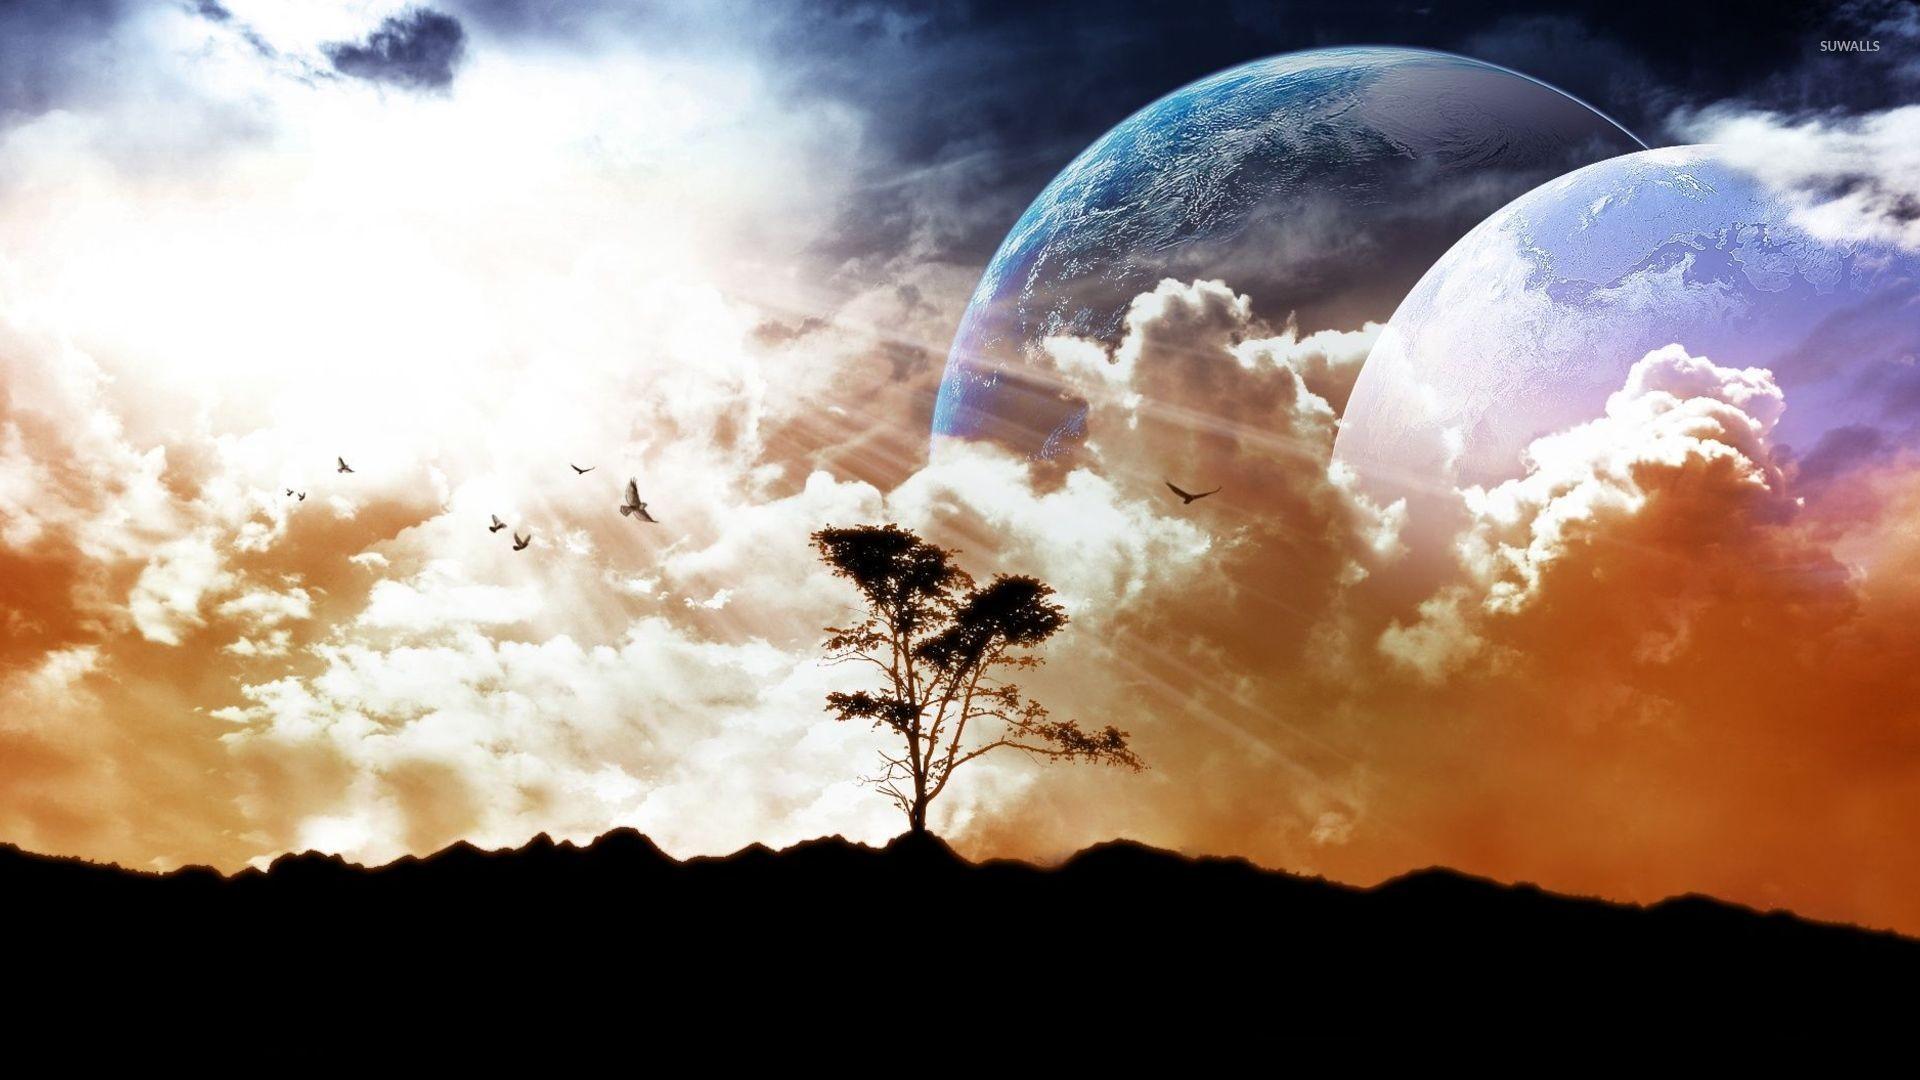 Two planets wallpaper jpg